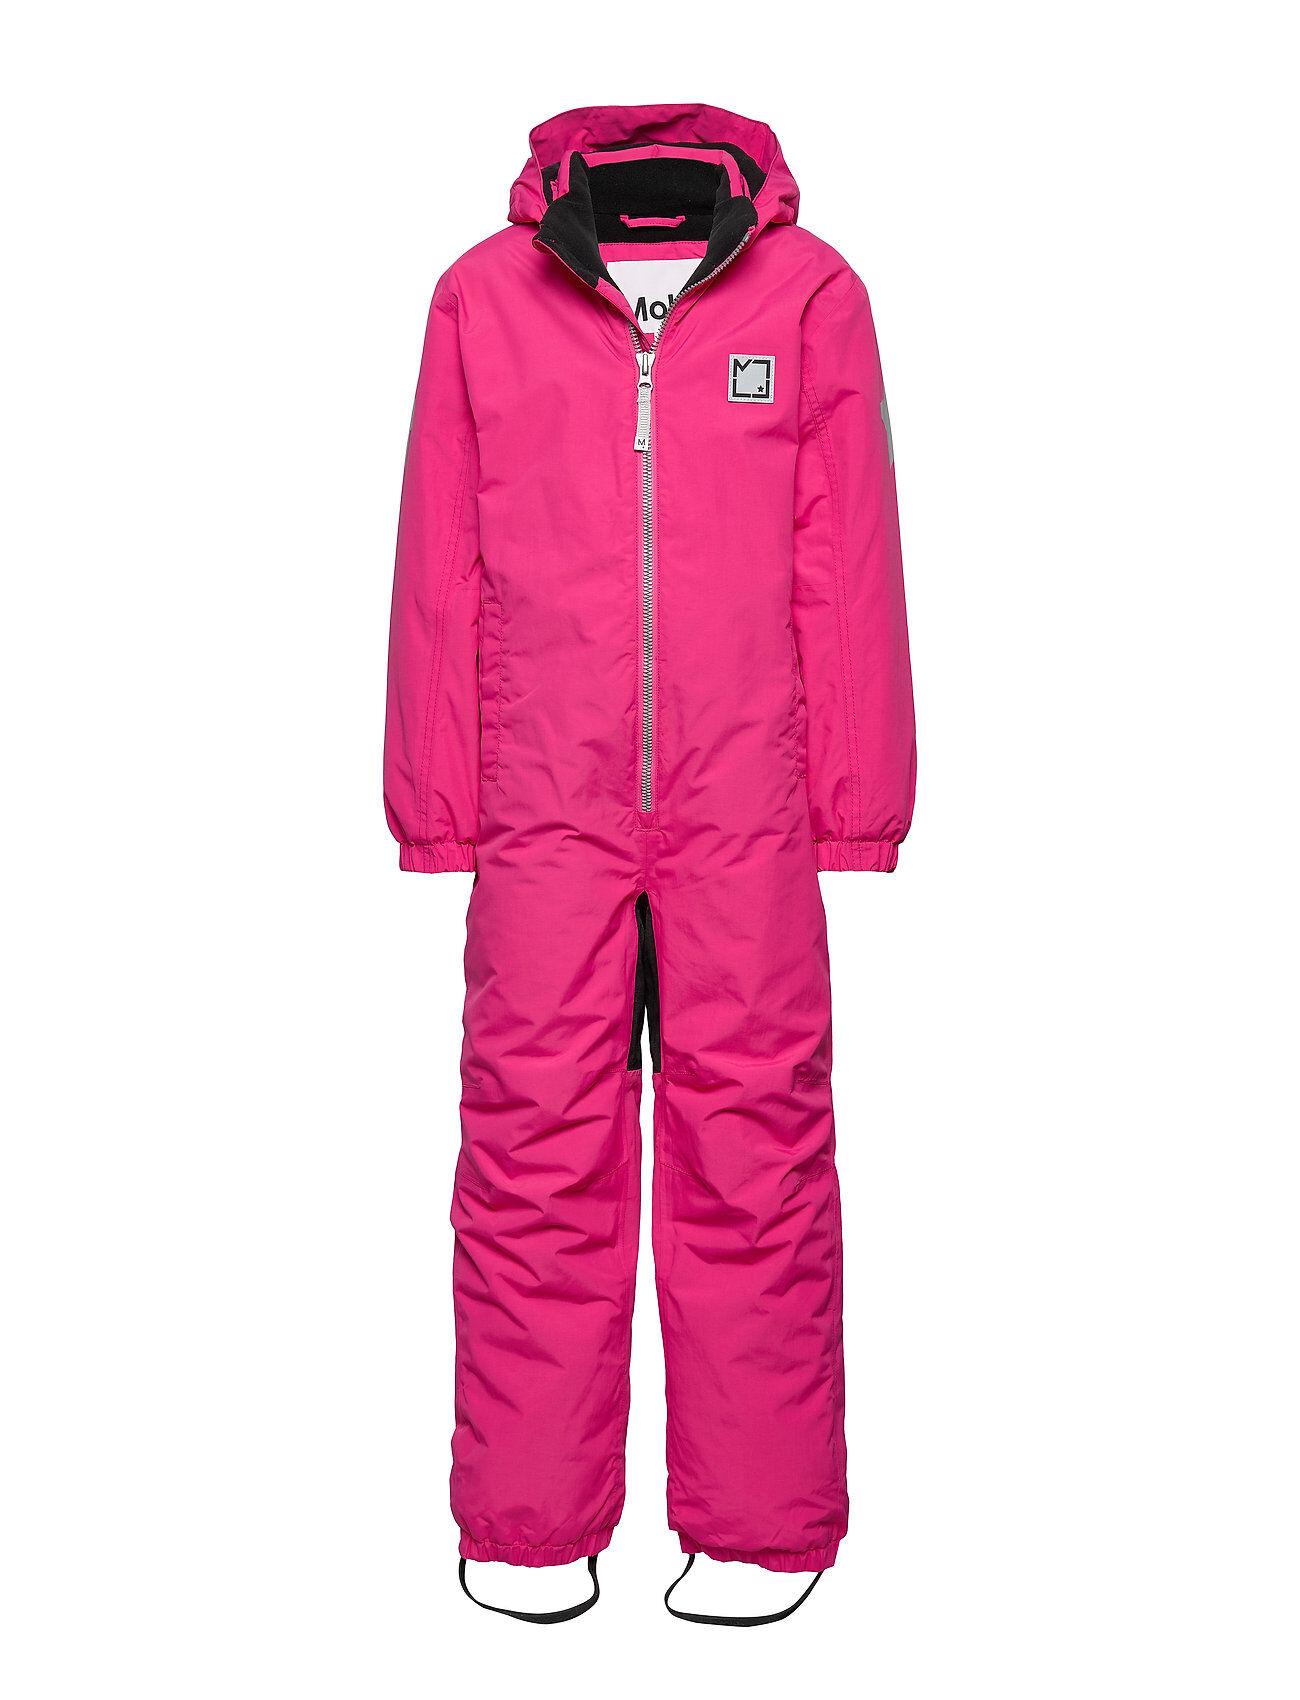 Molo Haze Outerwear Snow/ski Clothing Snow/ski Suits & Sets Vaaleanpunainen Molo